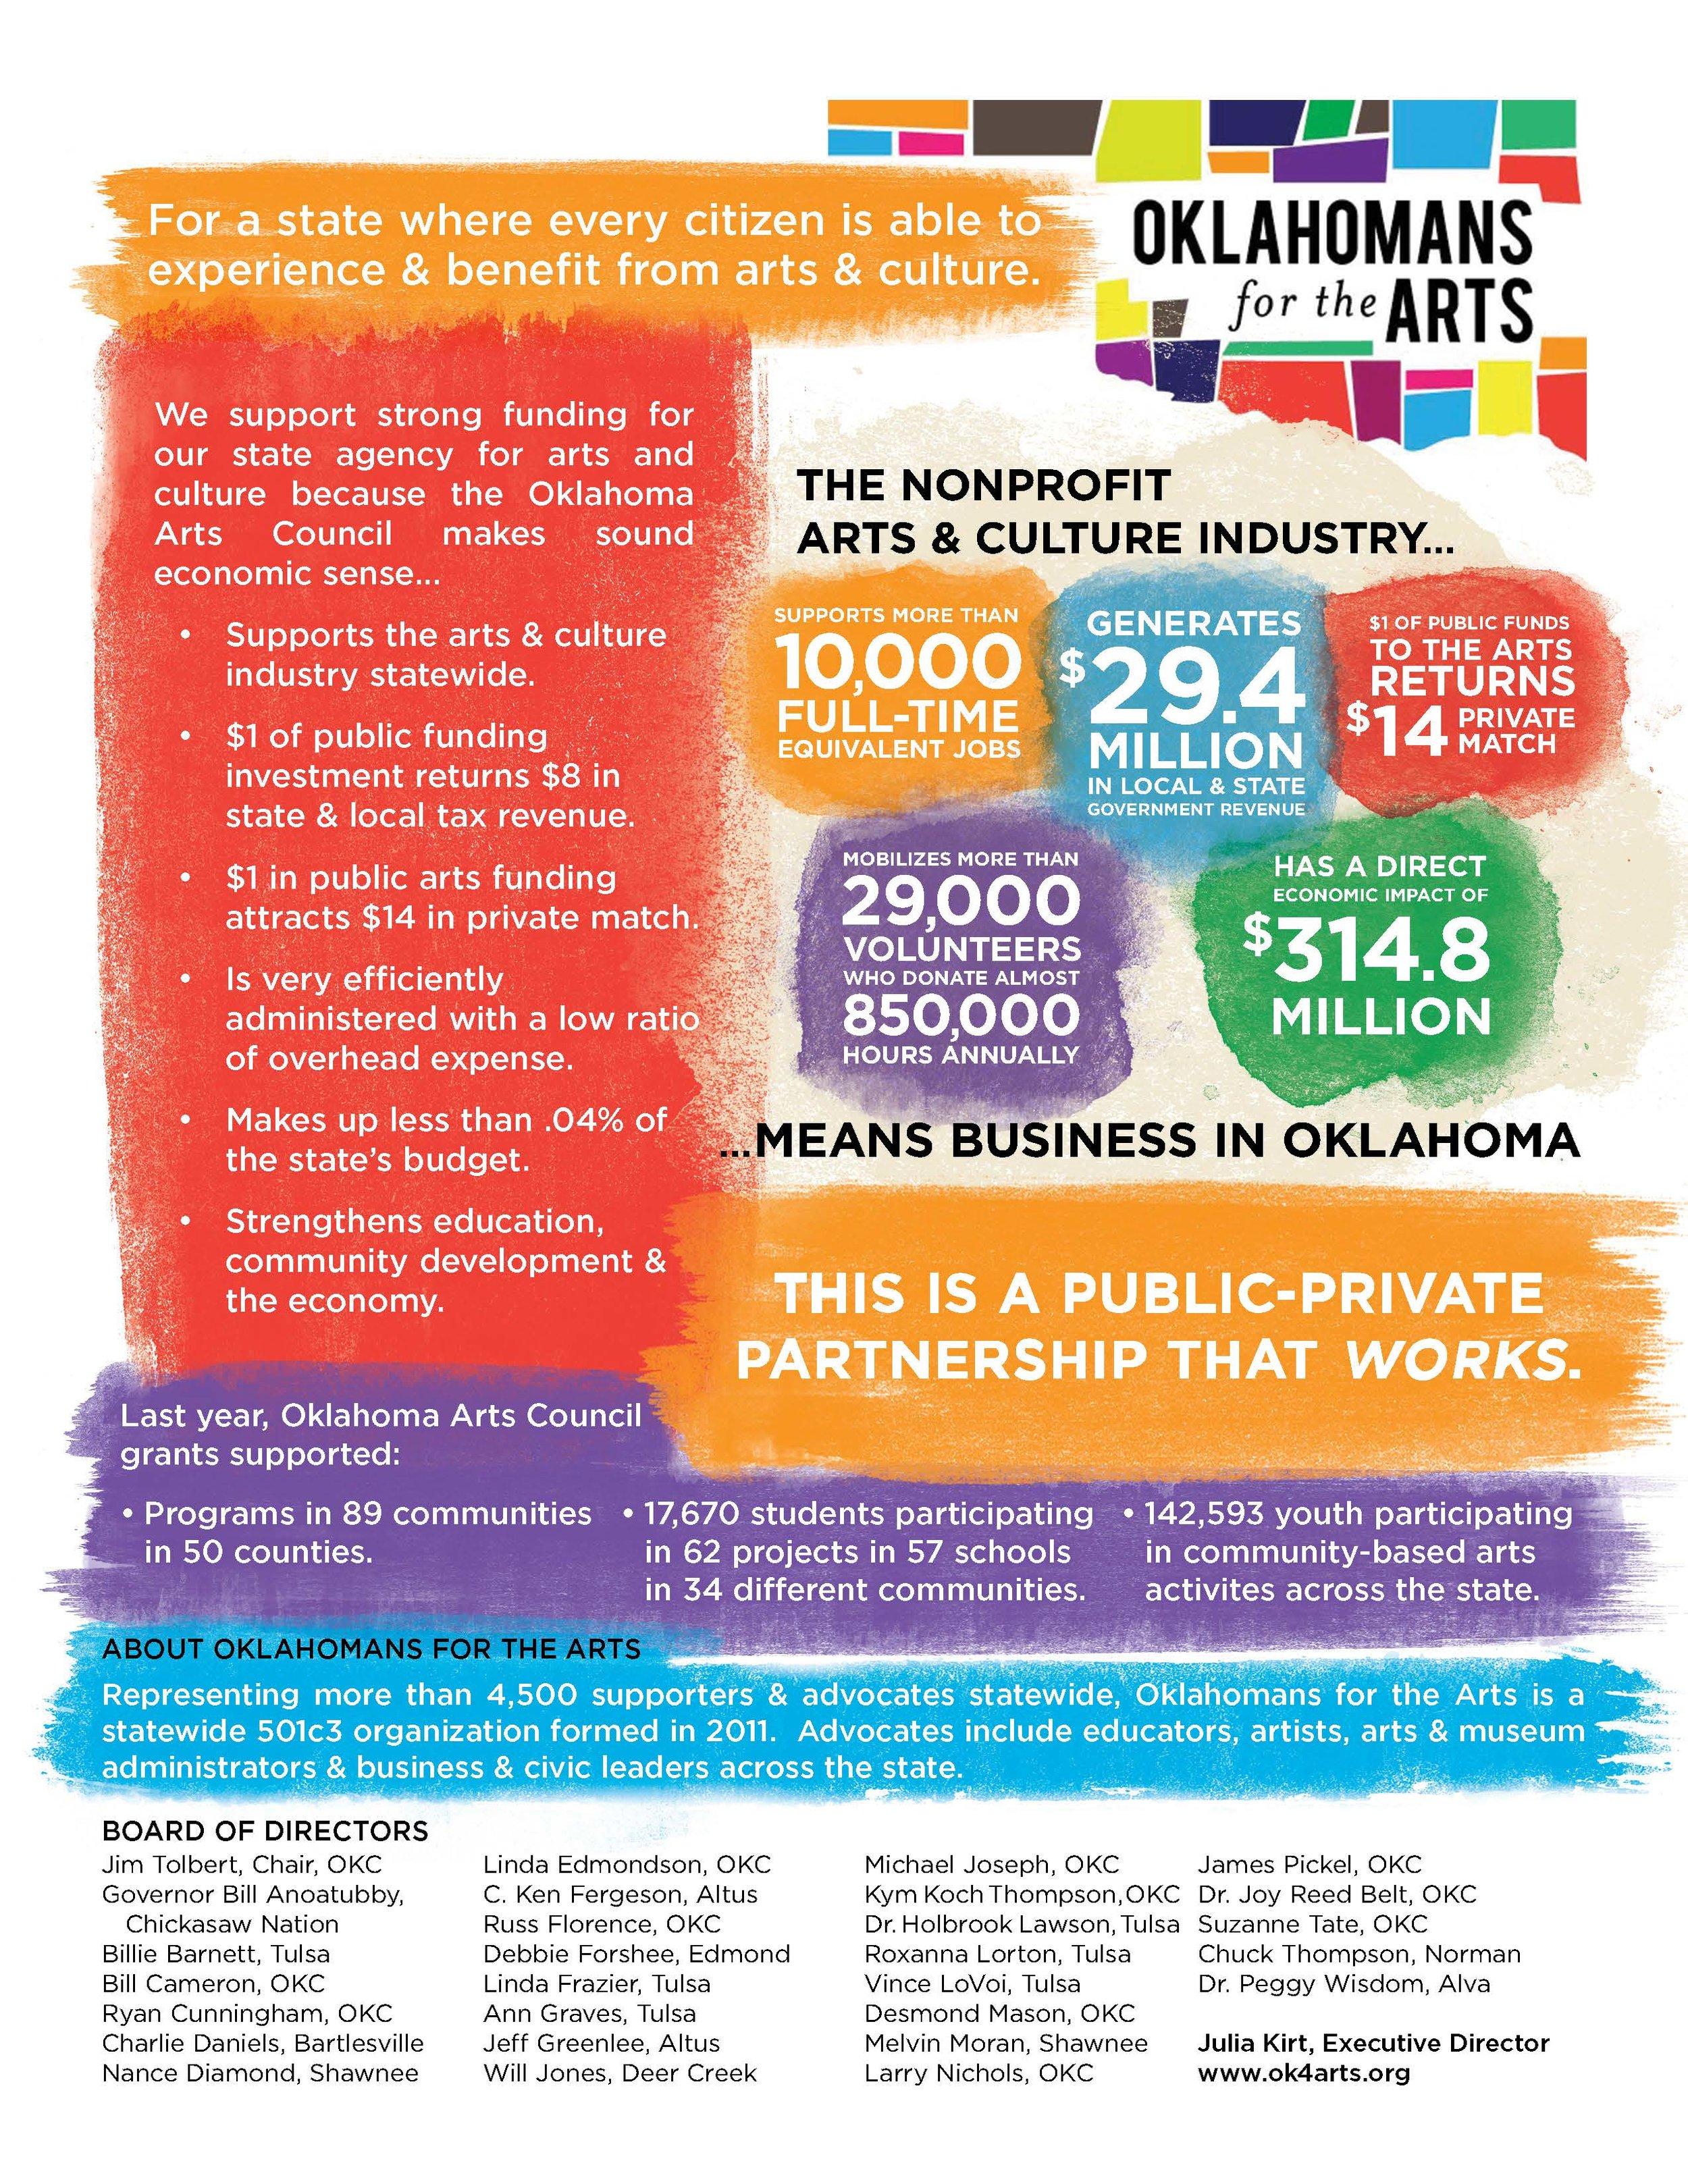 Oklahomans for the Arts' Legislative Priority Fact Sheets for Oklahoma Arts Day 2017